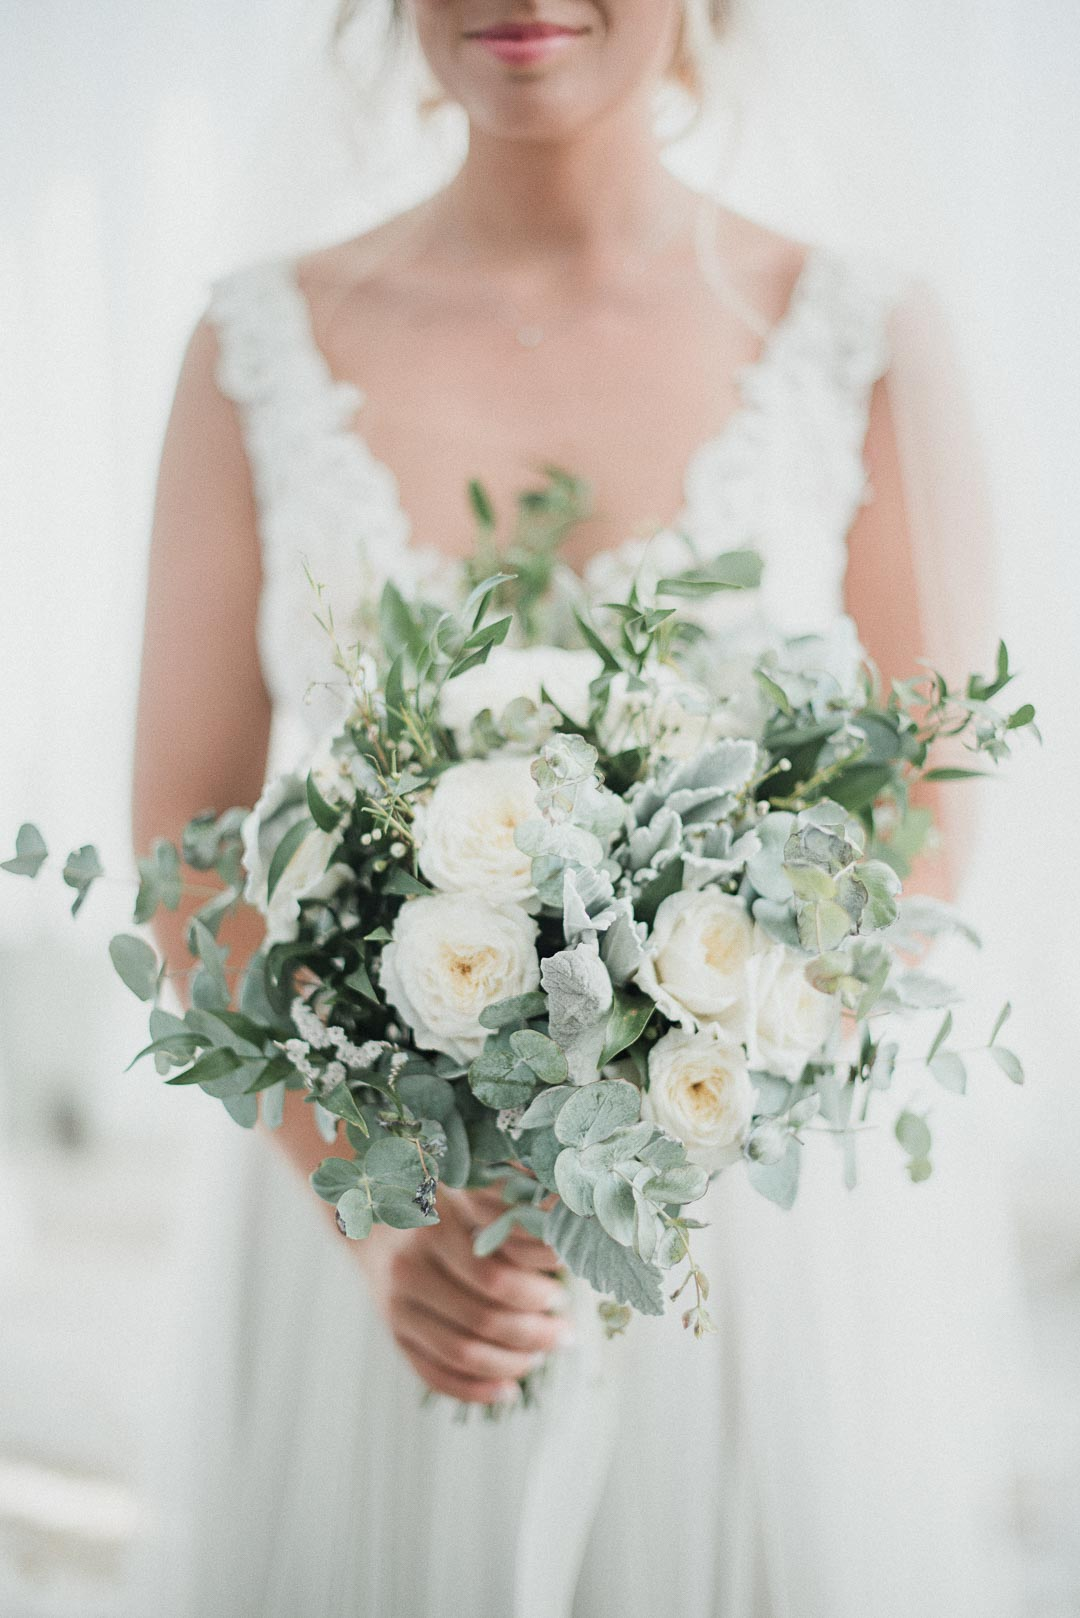 vivianeizzo-spazio46-wedding-photographer-destination-reportage-napoli-villacilento-34